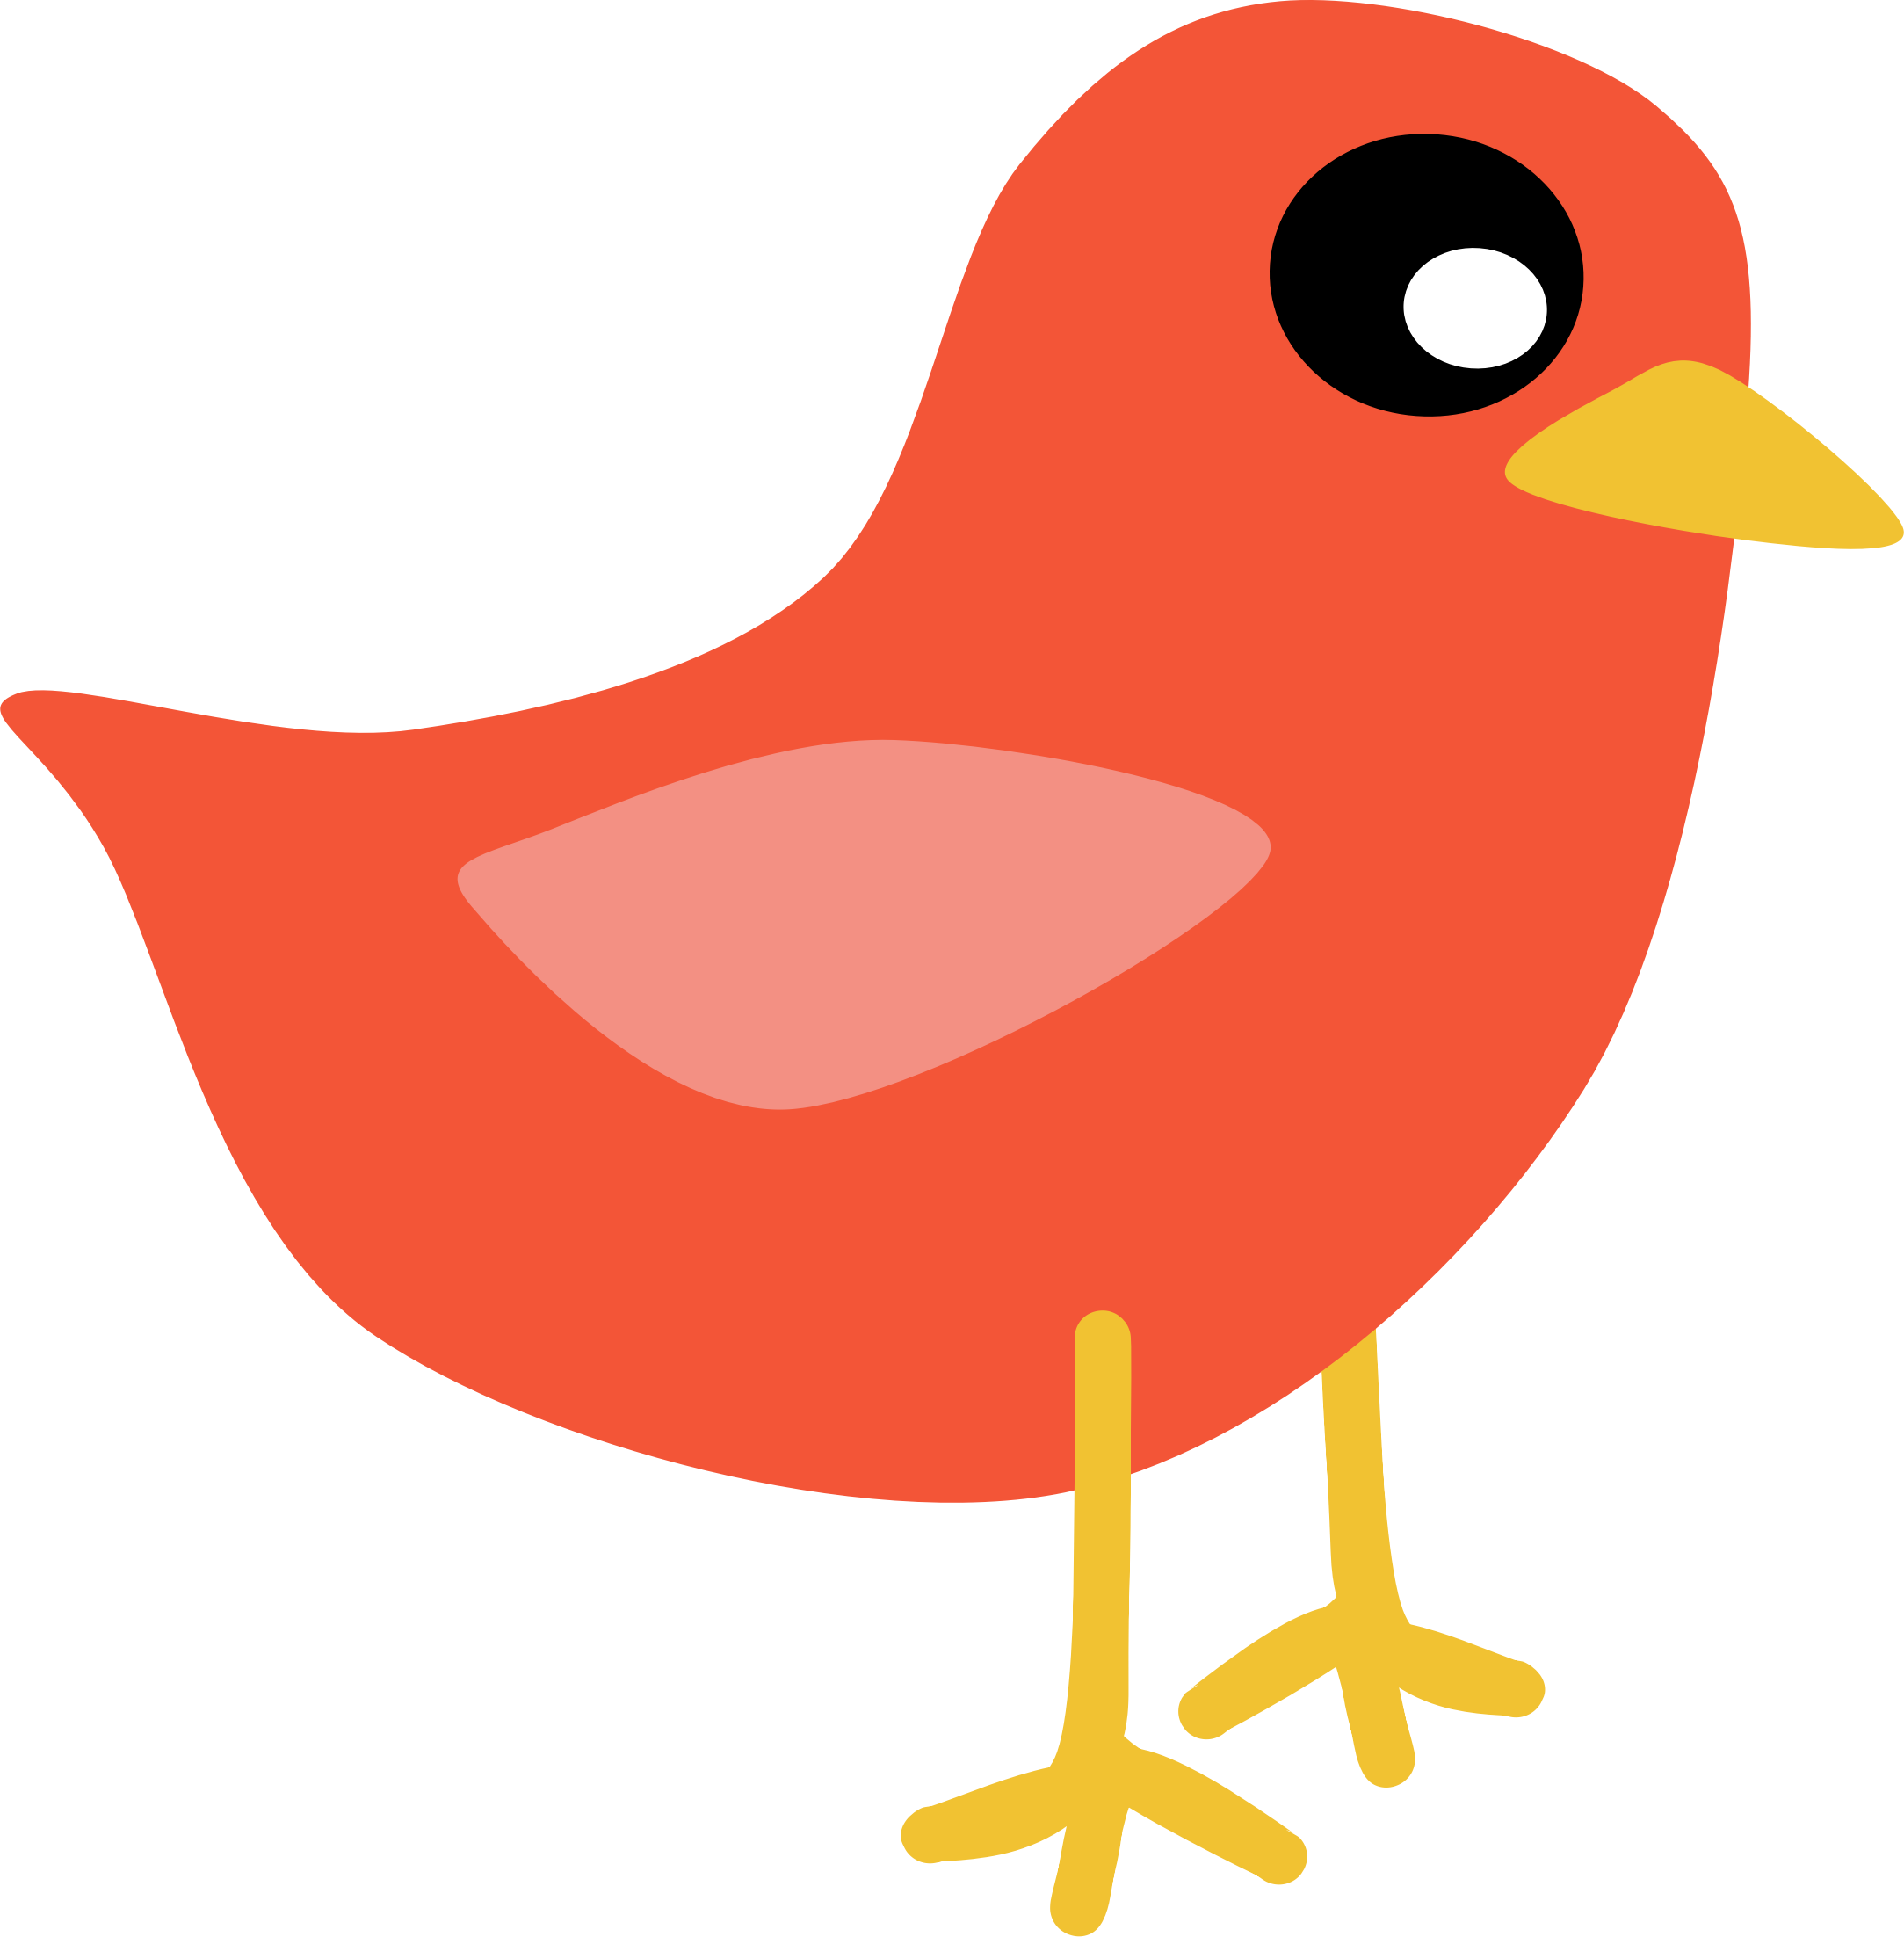 Bird clipart side view Birds art Cliparting com top